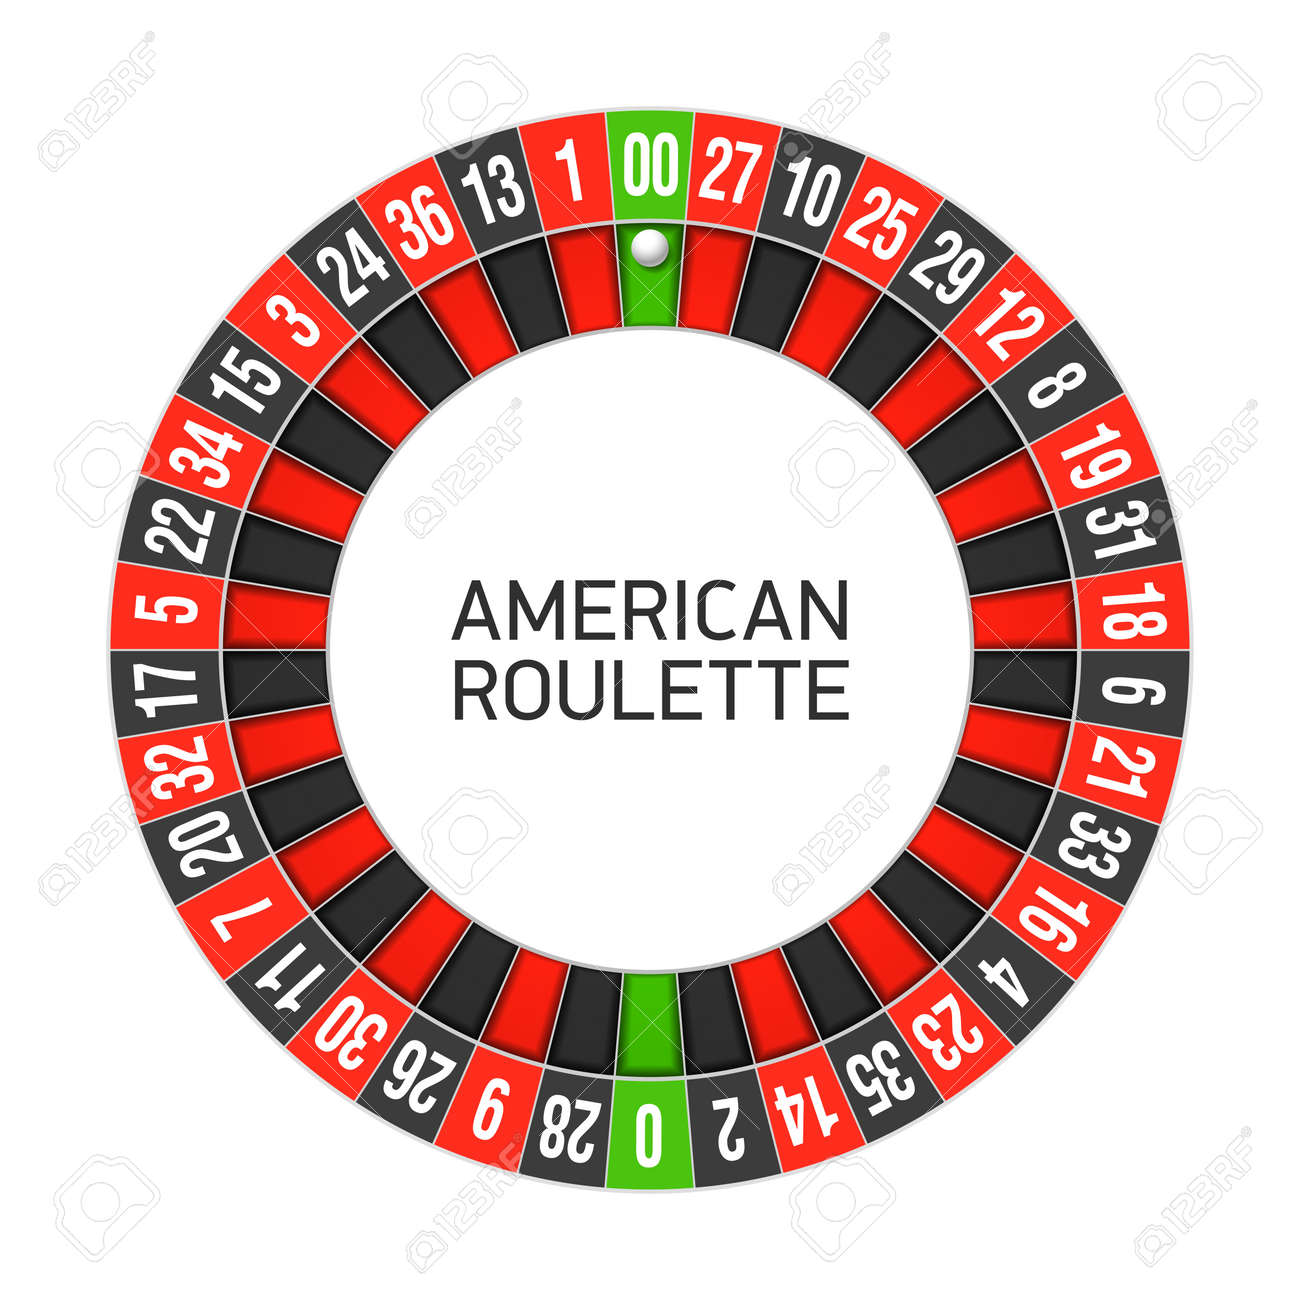 ffxiv mentor roulette list